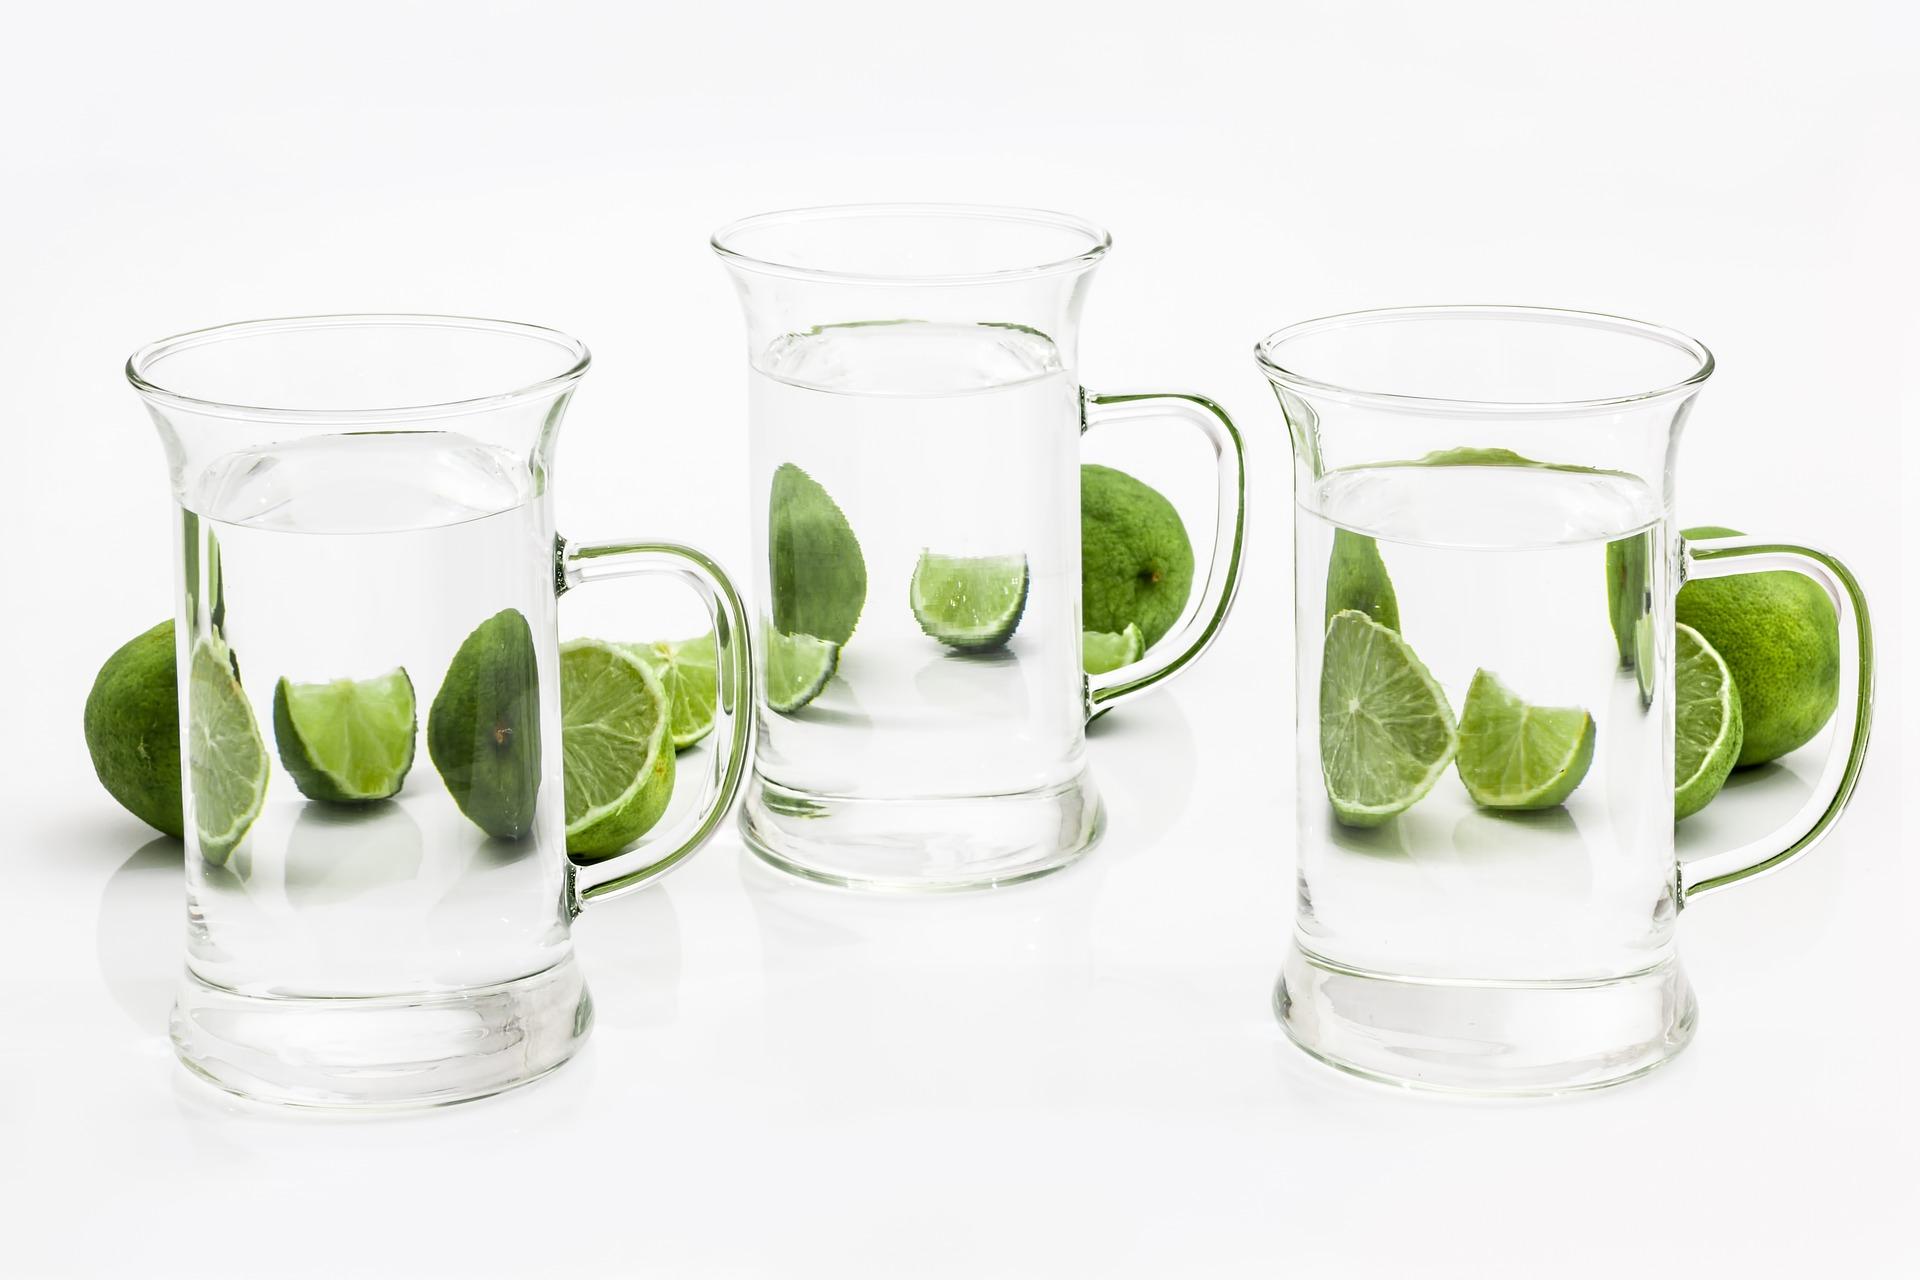 Sklo drink voda zlutozelena citrus kapalina